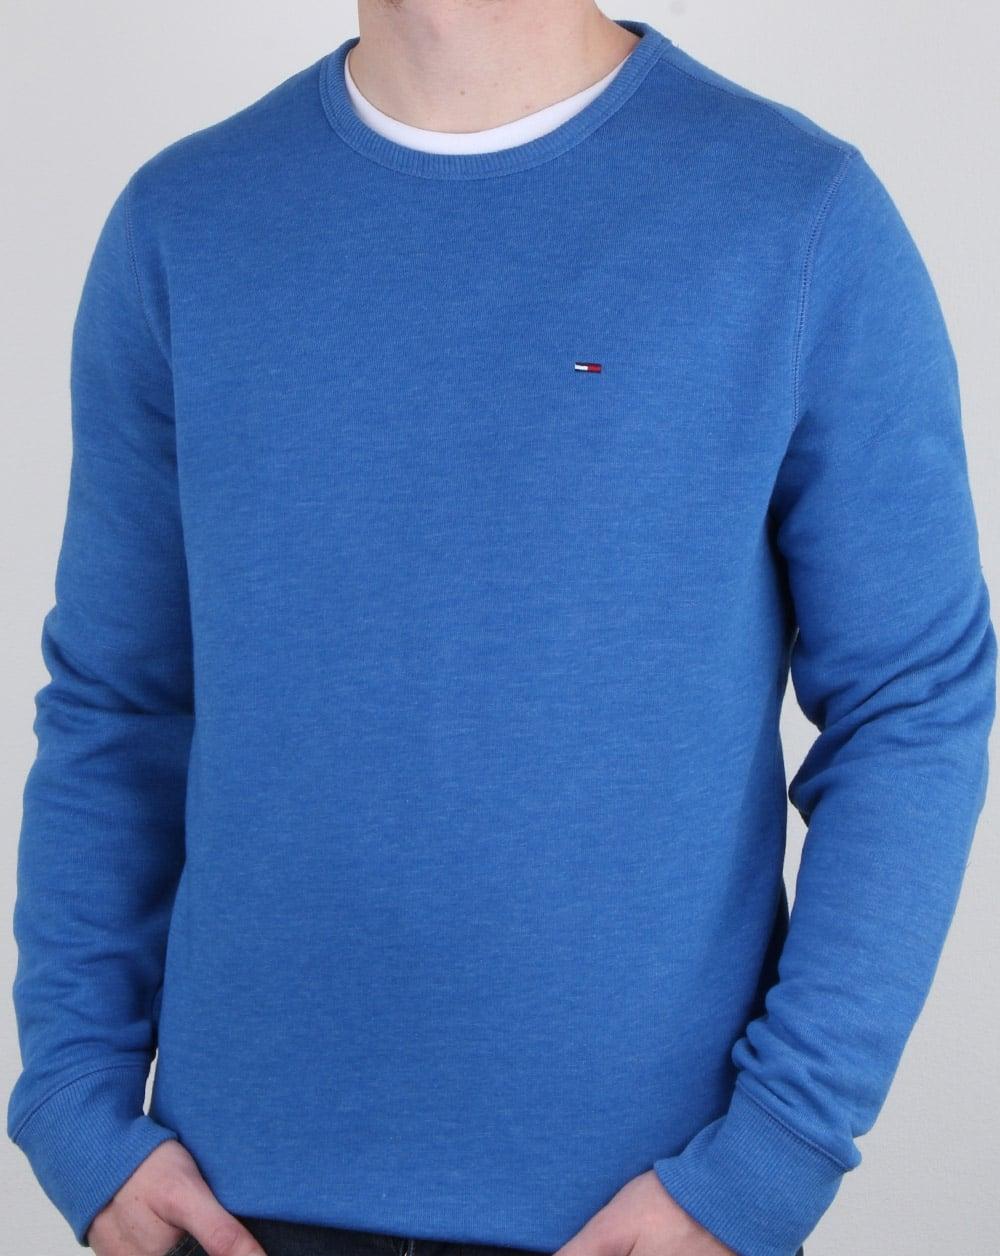 3744904a919 Tommy Hilfiger Jeans Tommy Hilfiger Cotton Fleece Sweatshirt Blue